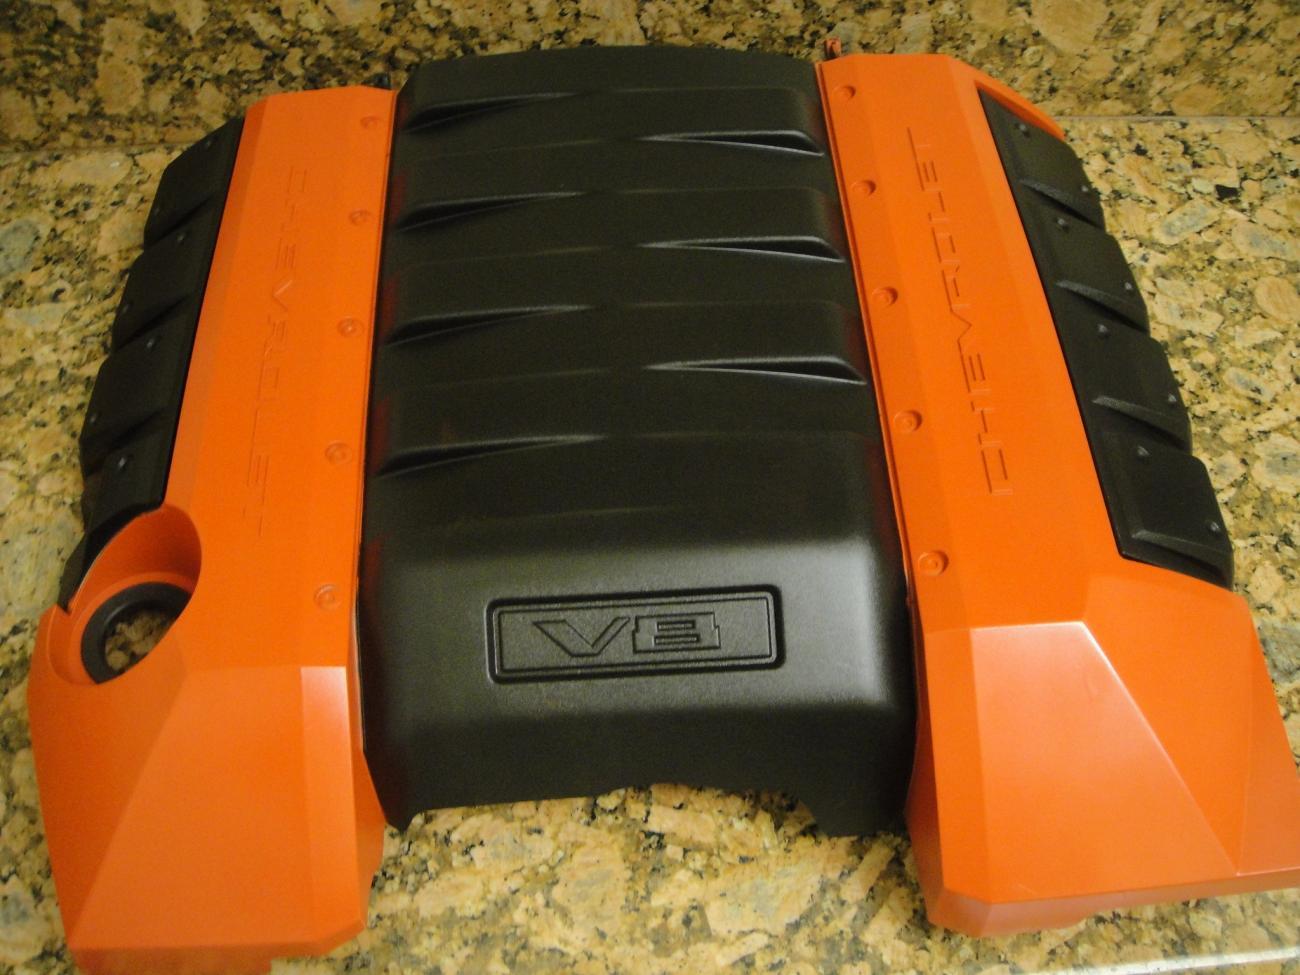 2012 Camaro Zl1 For Sale >> 2010 Camaro SS Orange Engine Cover for sale!!!! - Camaro5 ...